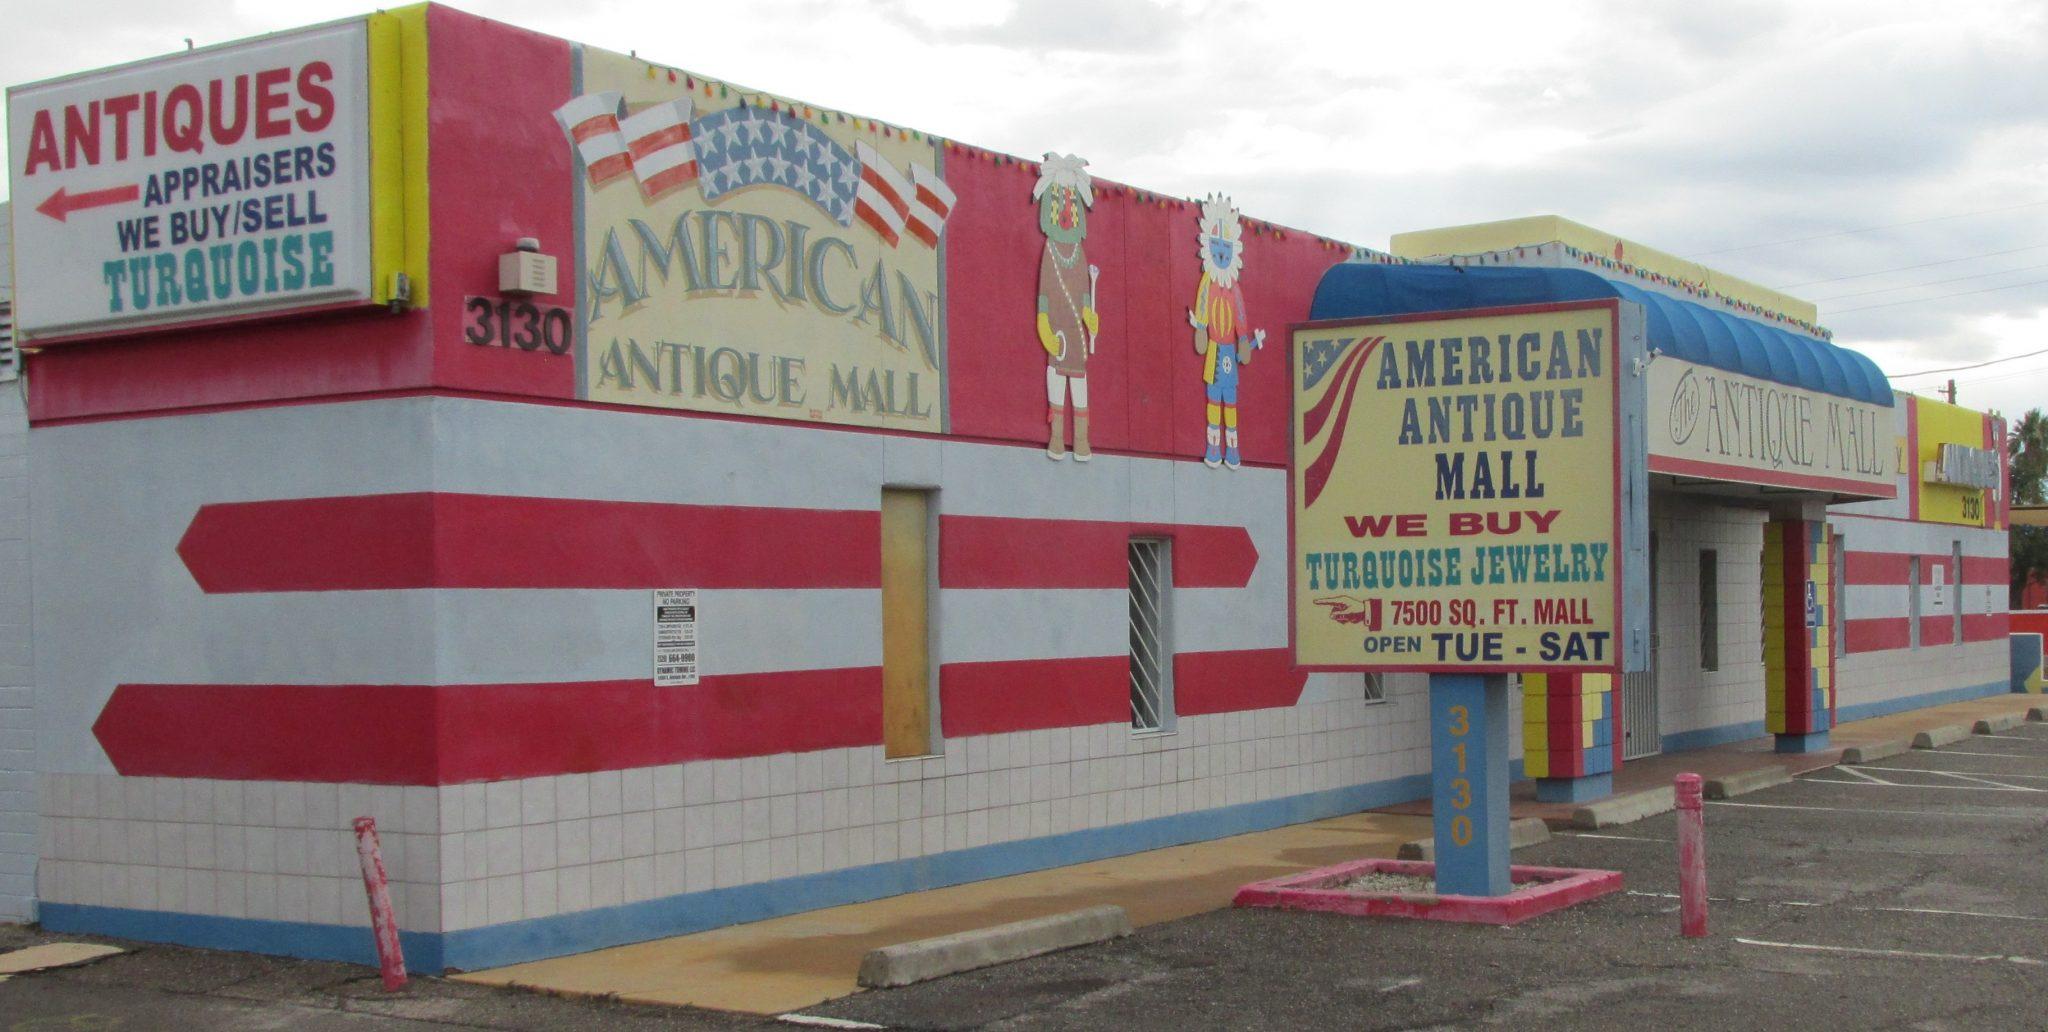 Antique Mall America